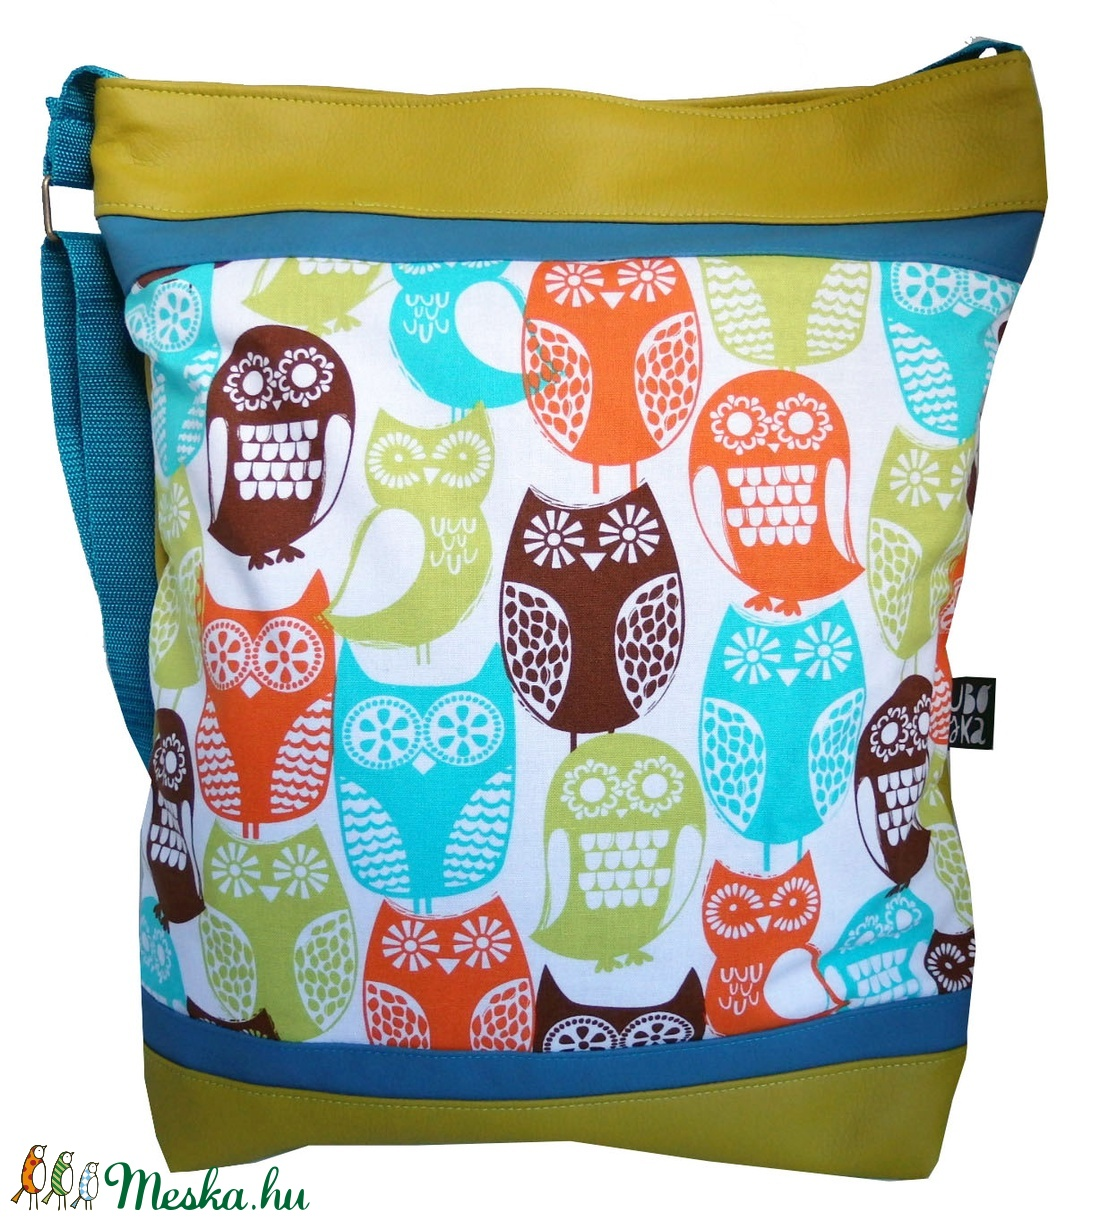 Baglyos designer táska (gubolyka) - Meska.hu a00cb2ef6f